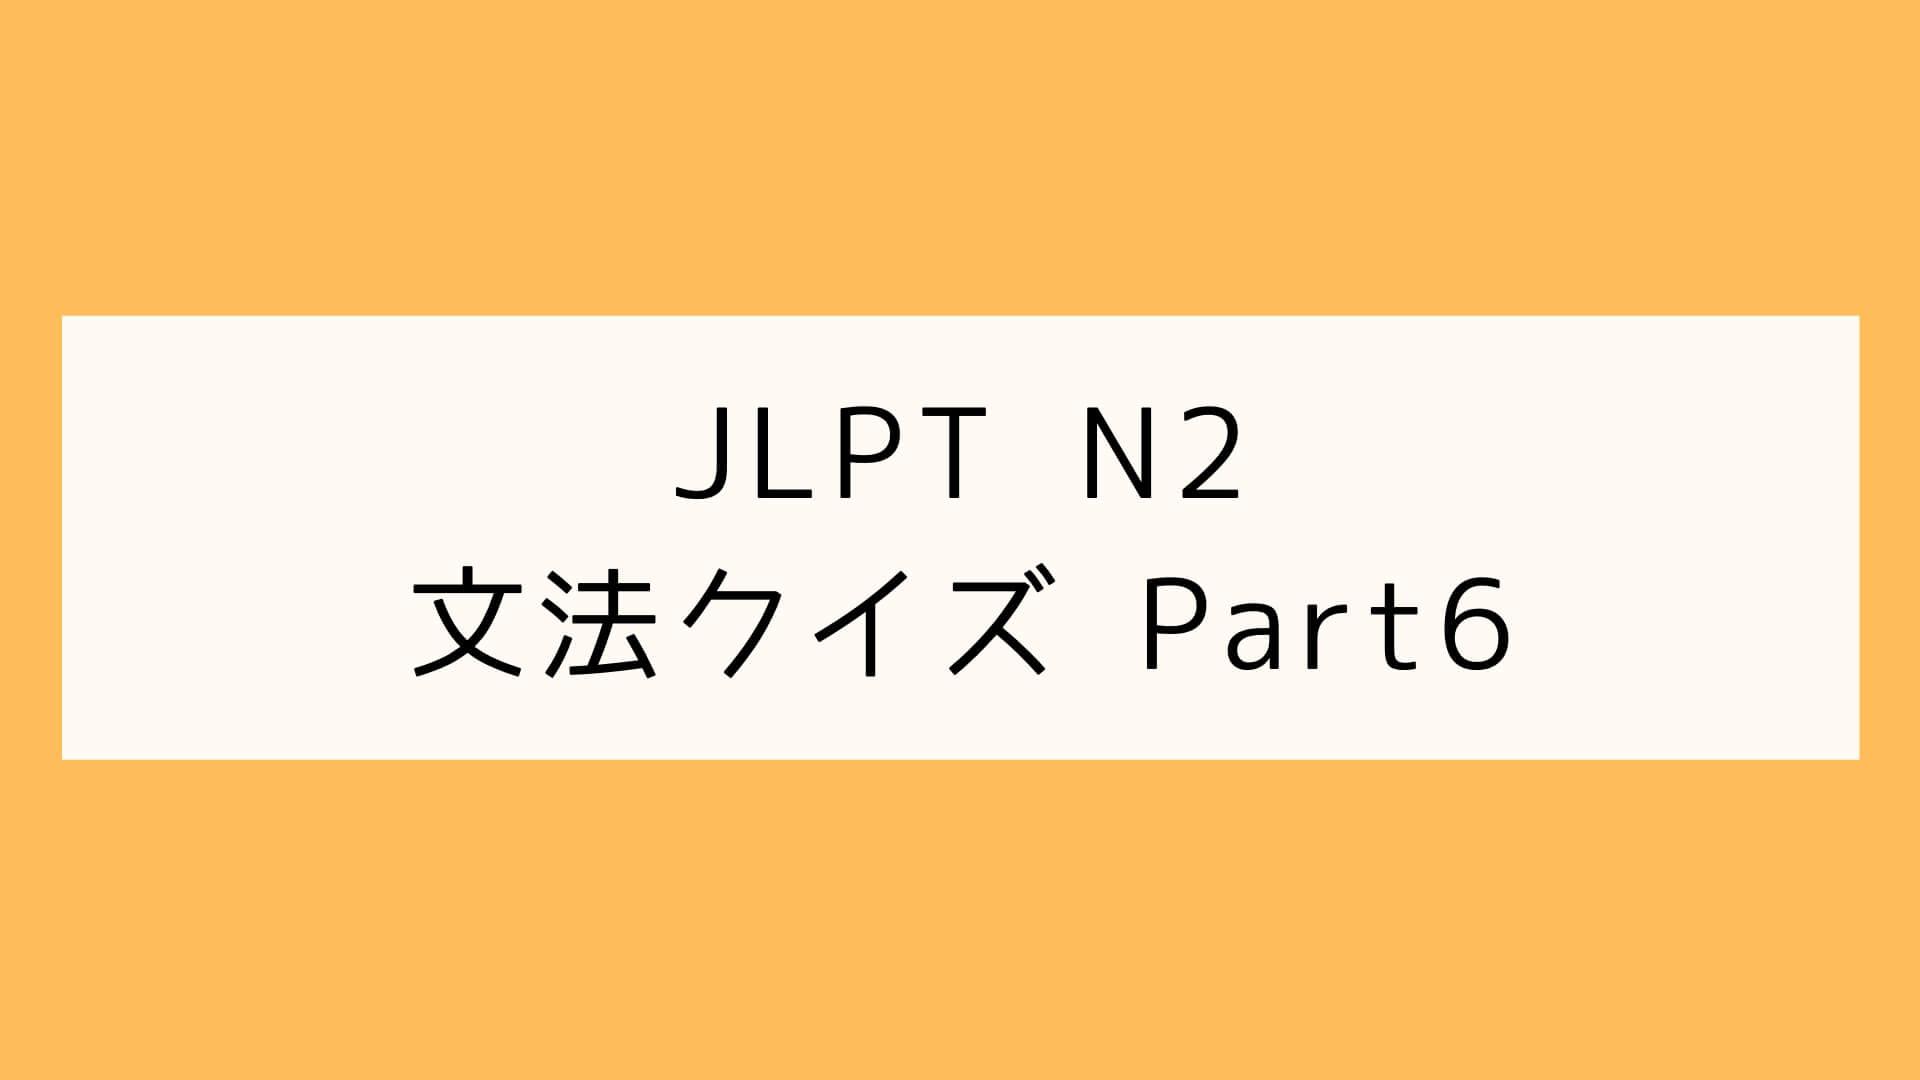 【JLPT N2】文法クイズ Part6